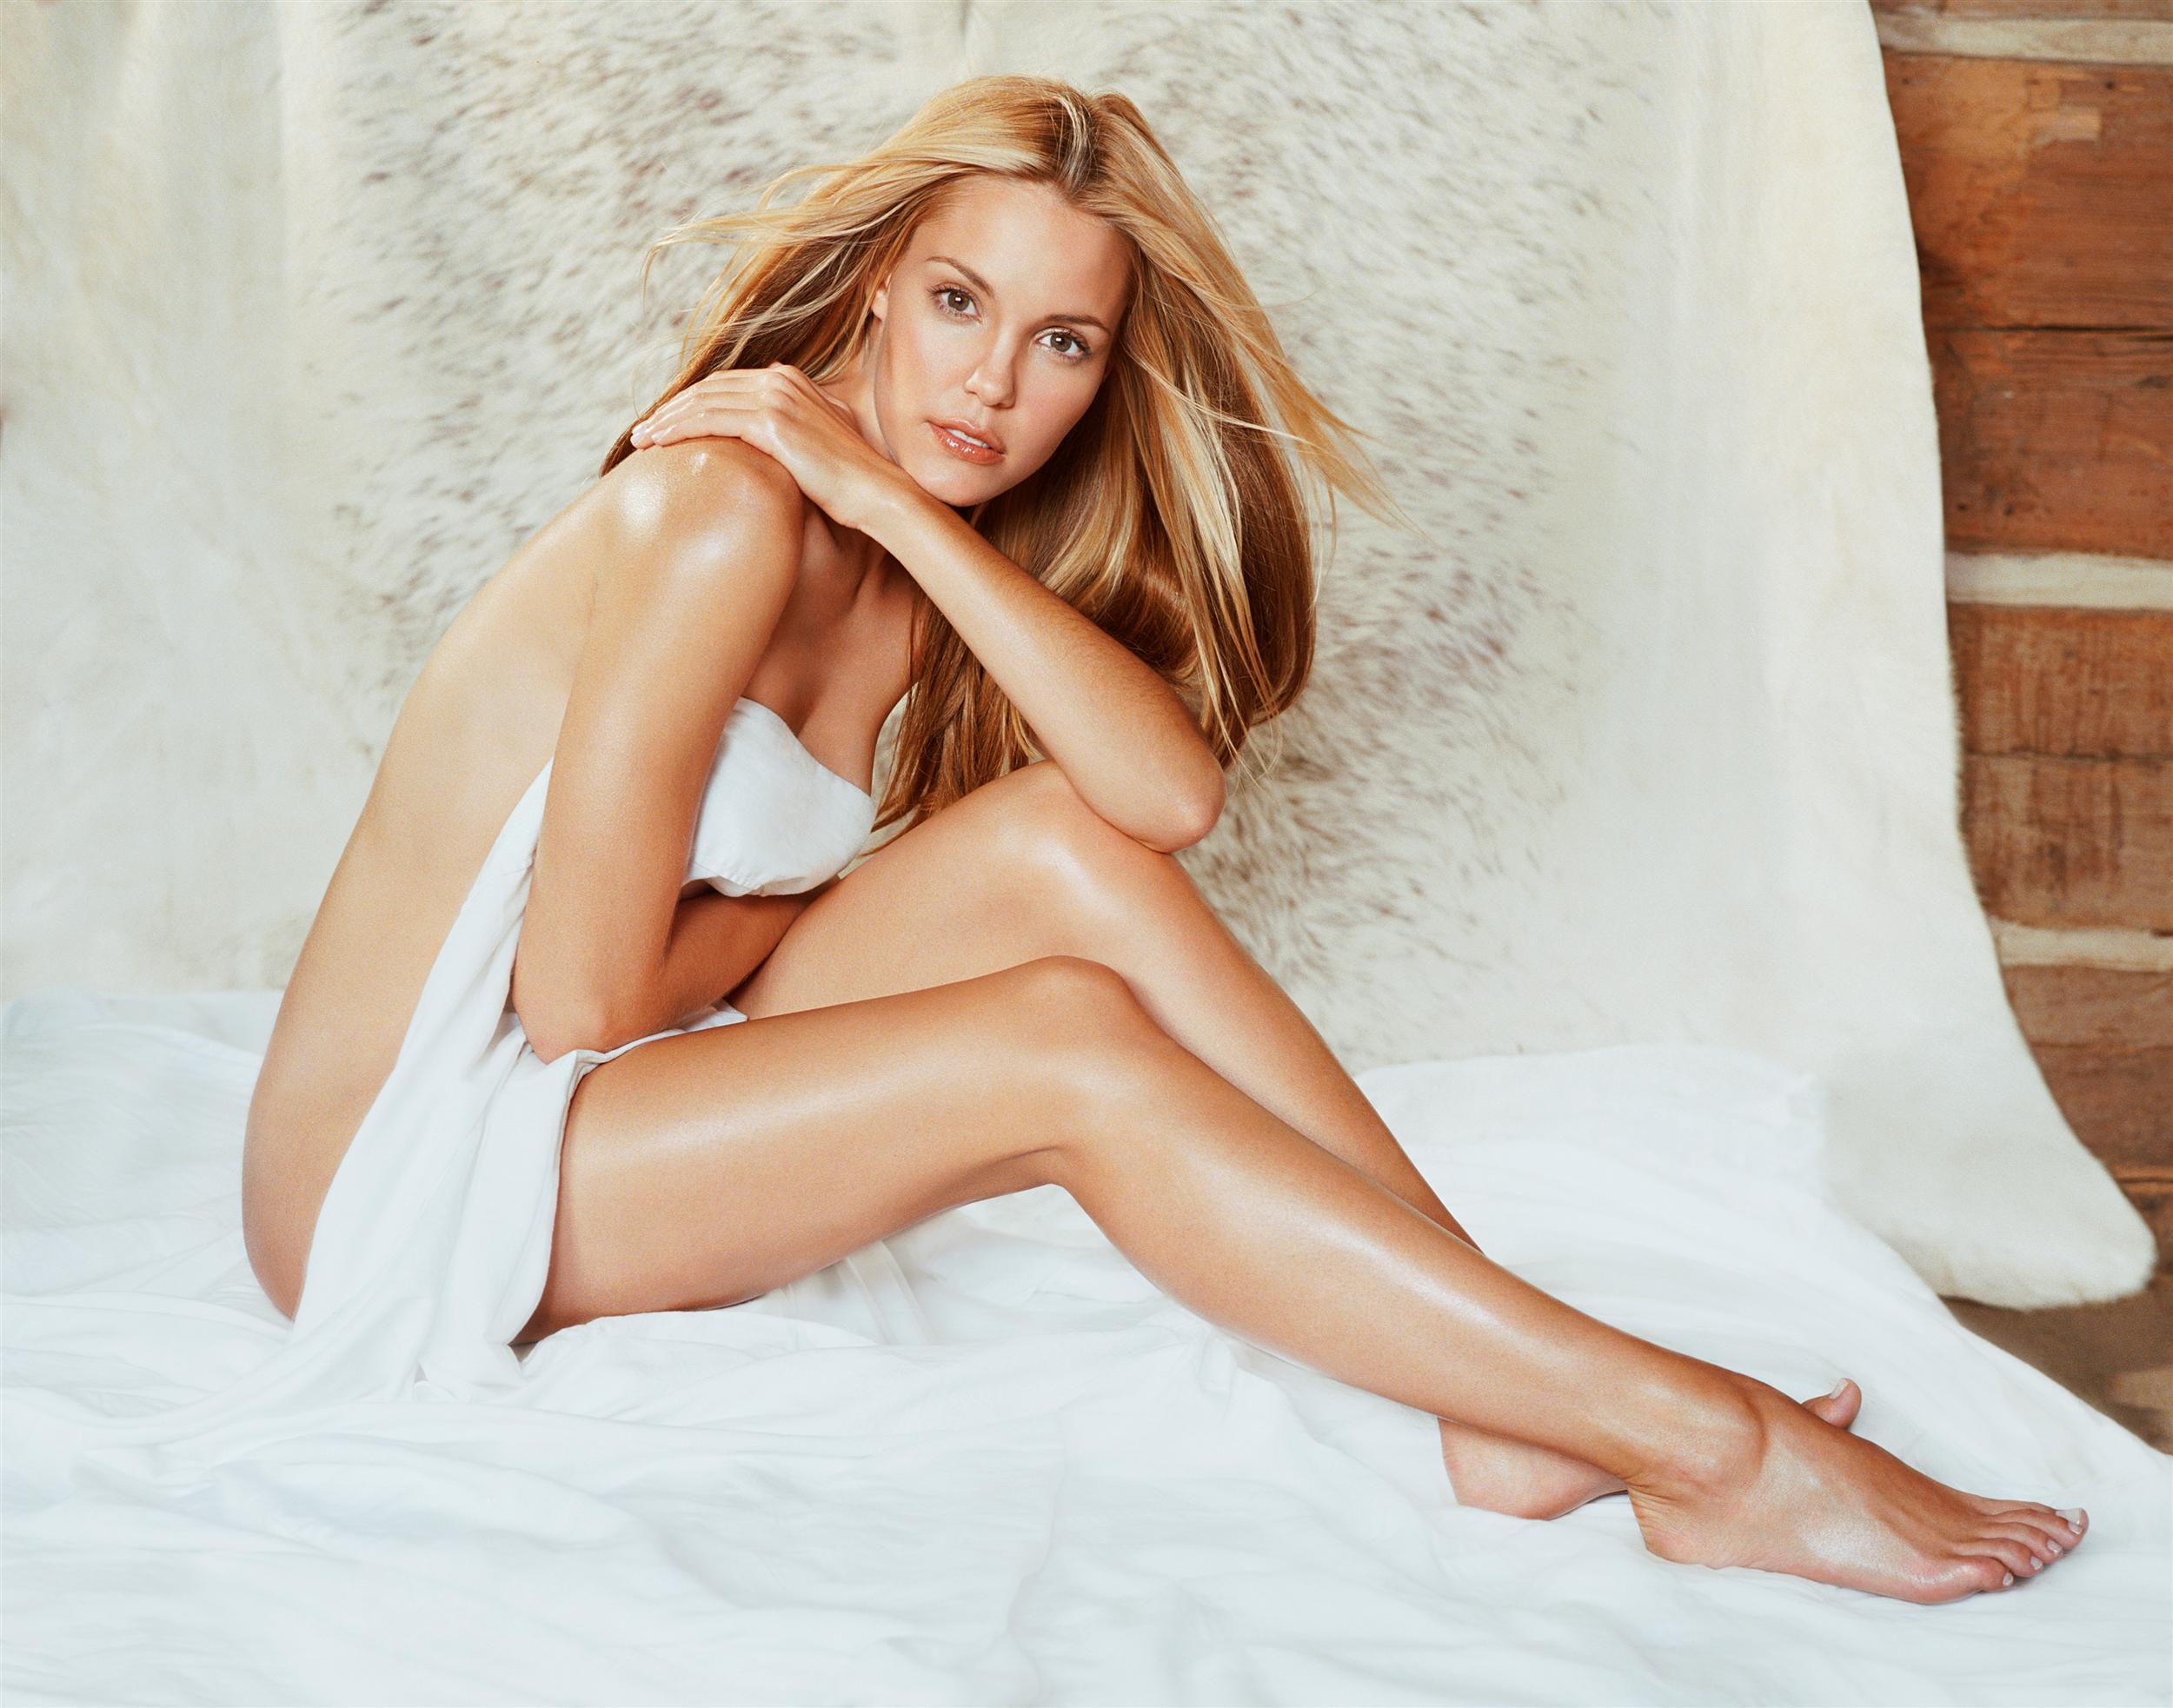 Leslie bibb nude naked, free nude spring break picts